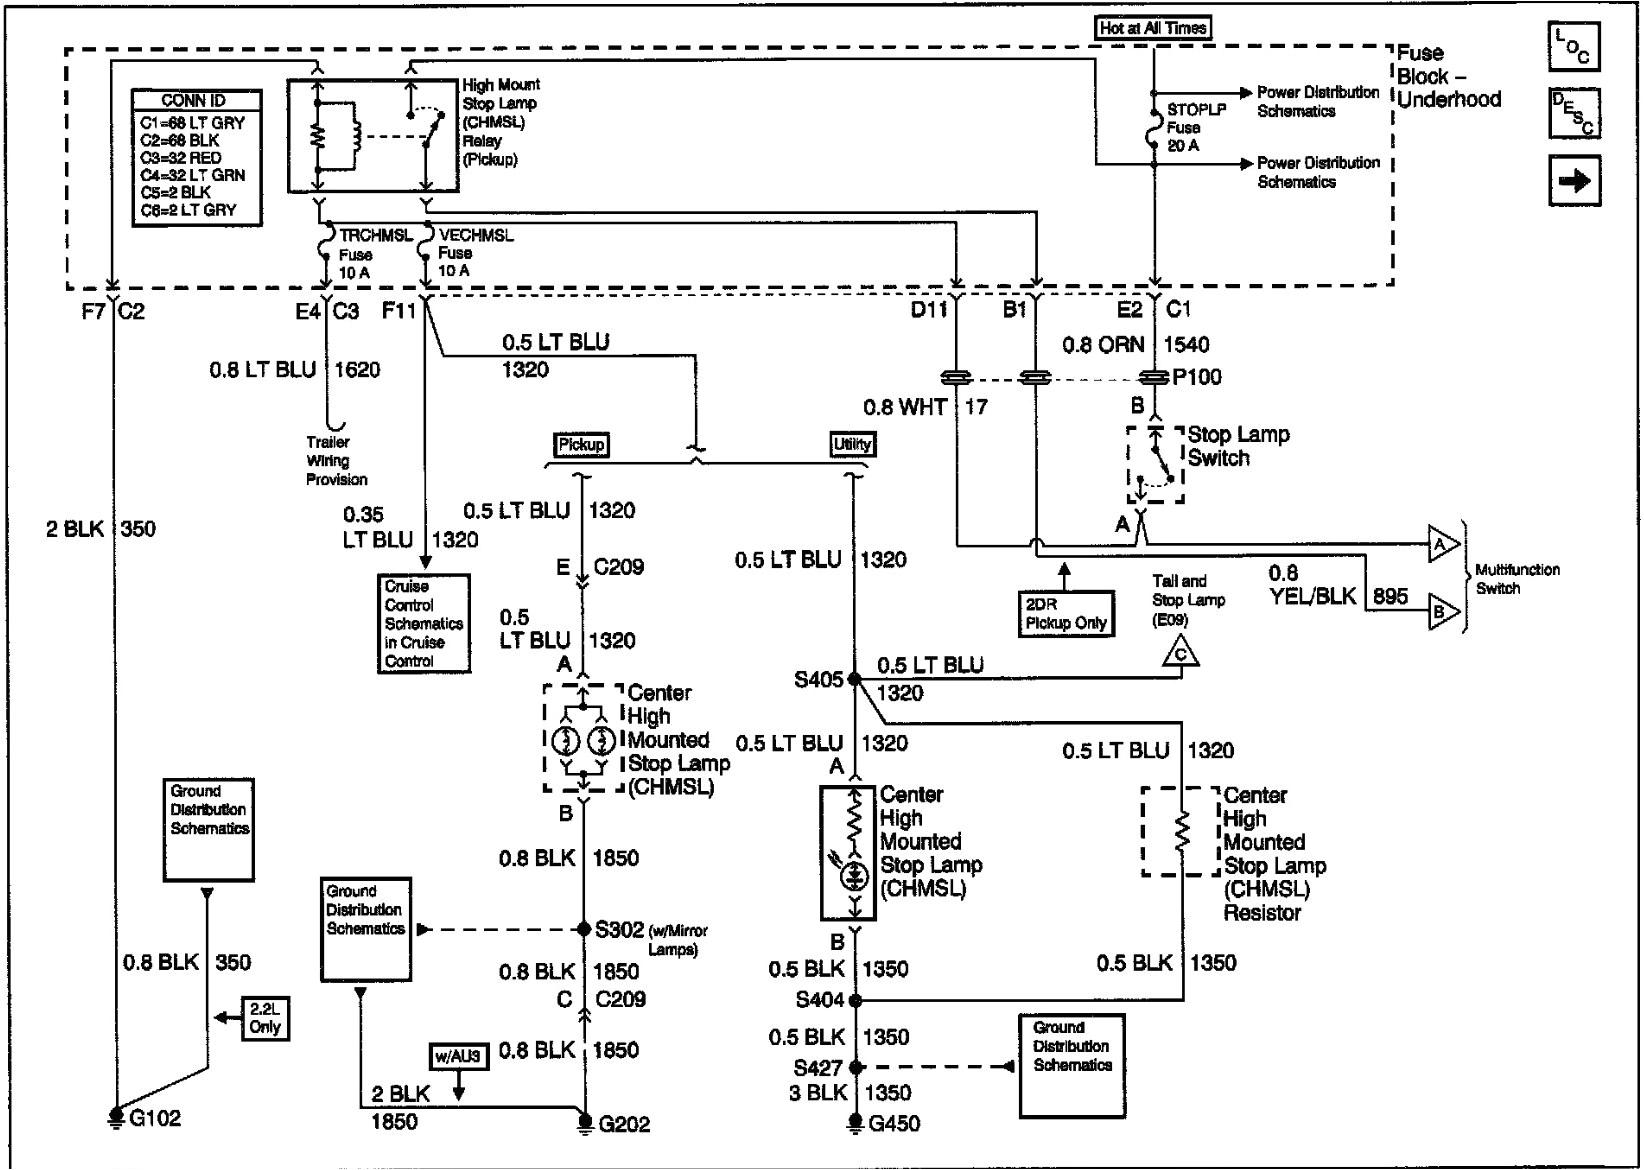 mitsubishi tail light wiring schema wiring diagram mitsubishi triton ecu wiring diagram mitsubishi triton wiring diagram